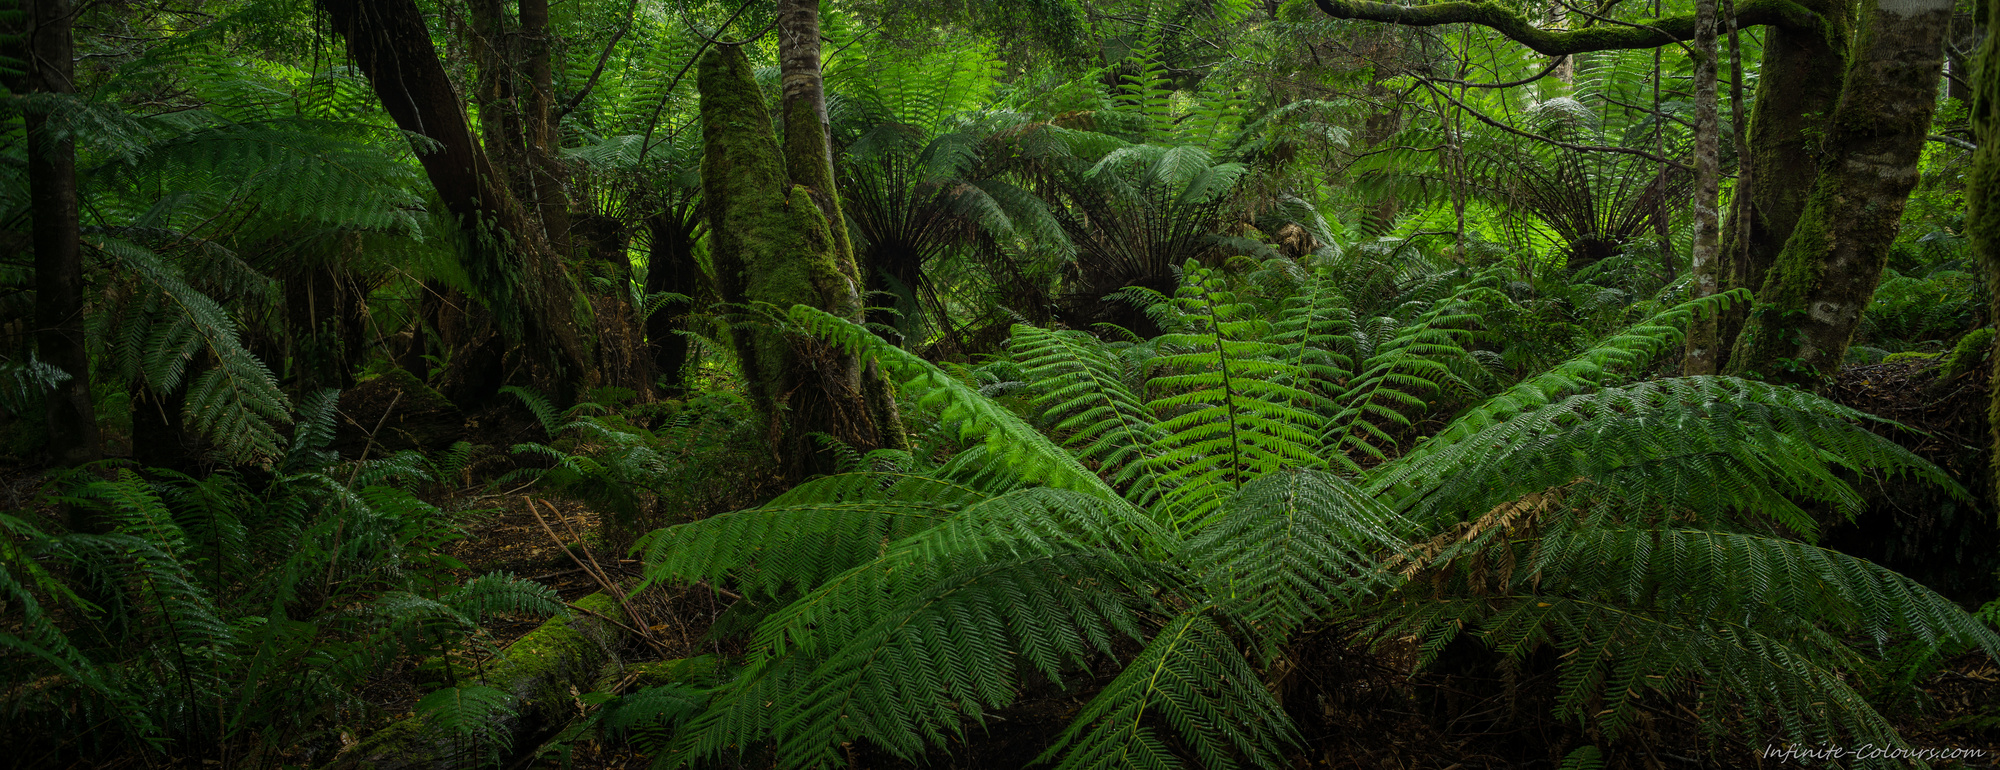 Tasmania temperate rainforest tree ferns, Styx River, Mount Field National Park